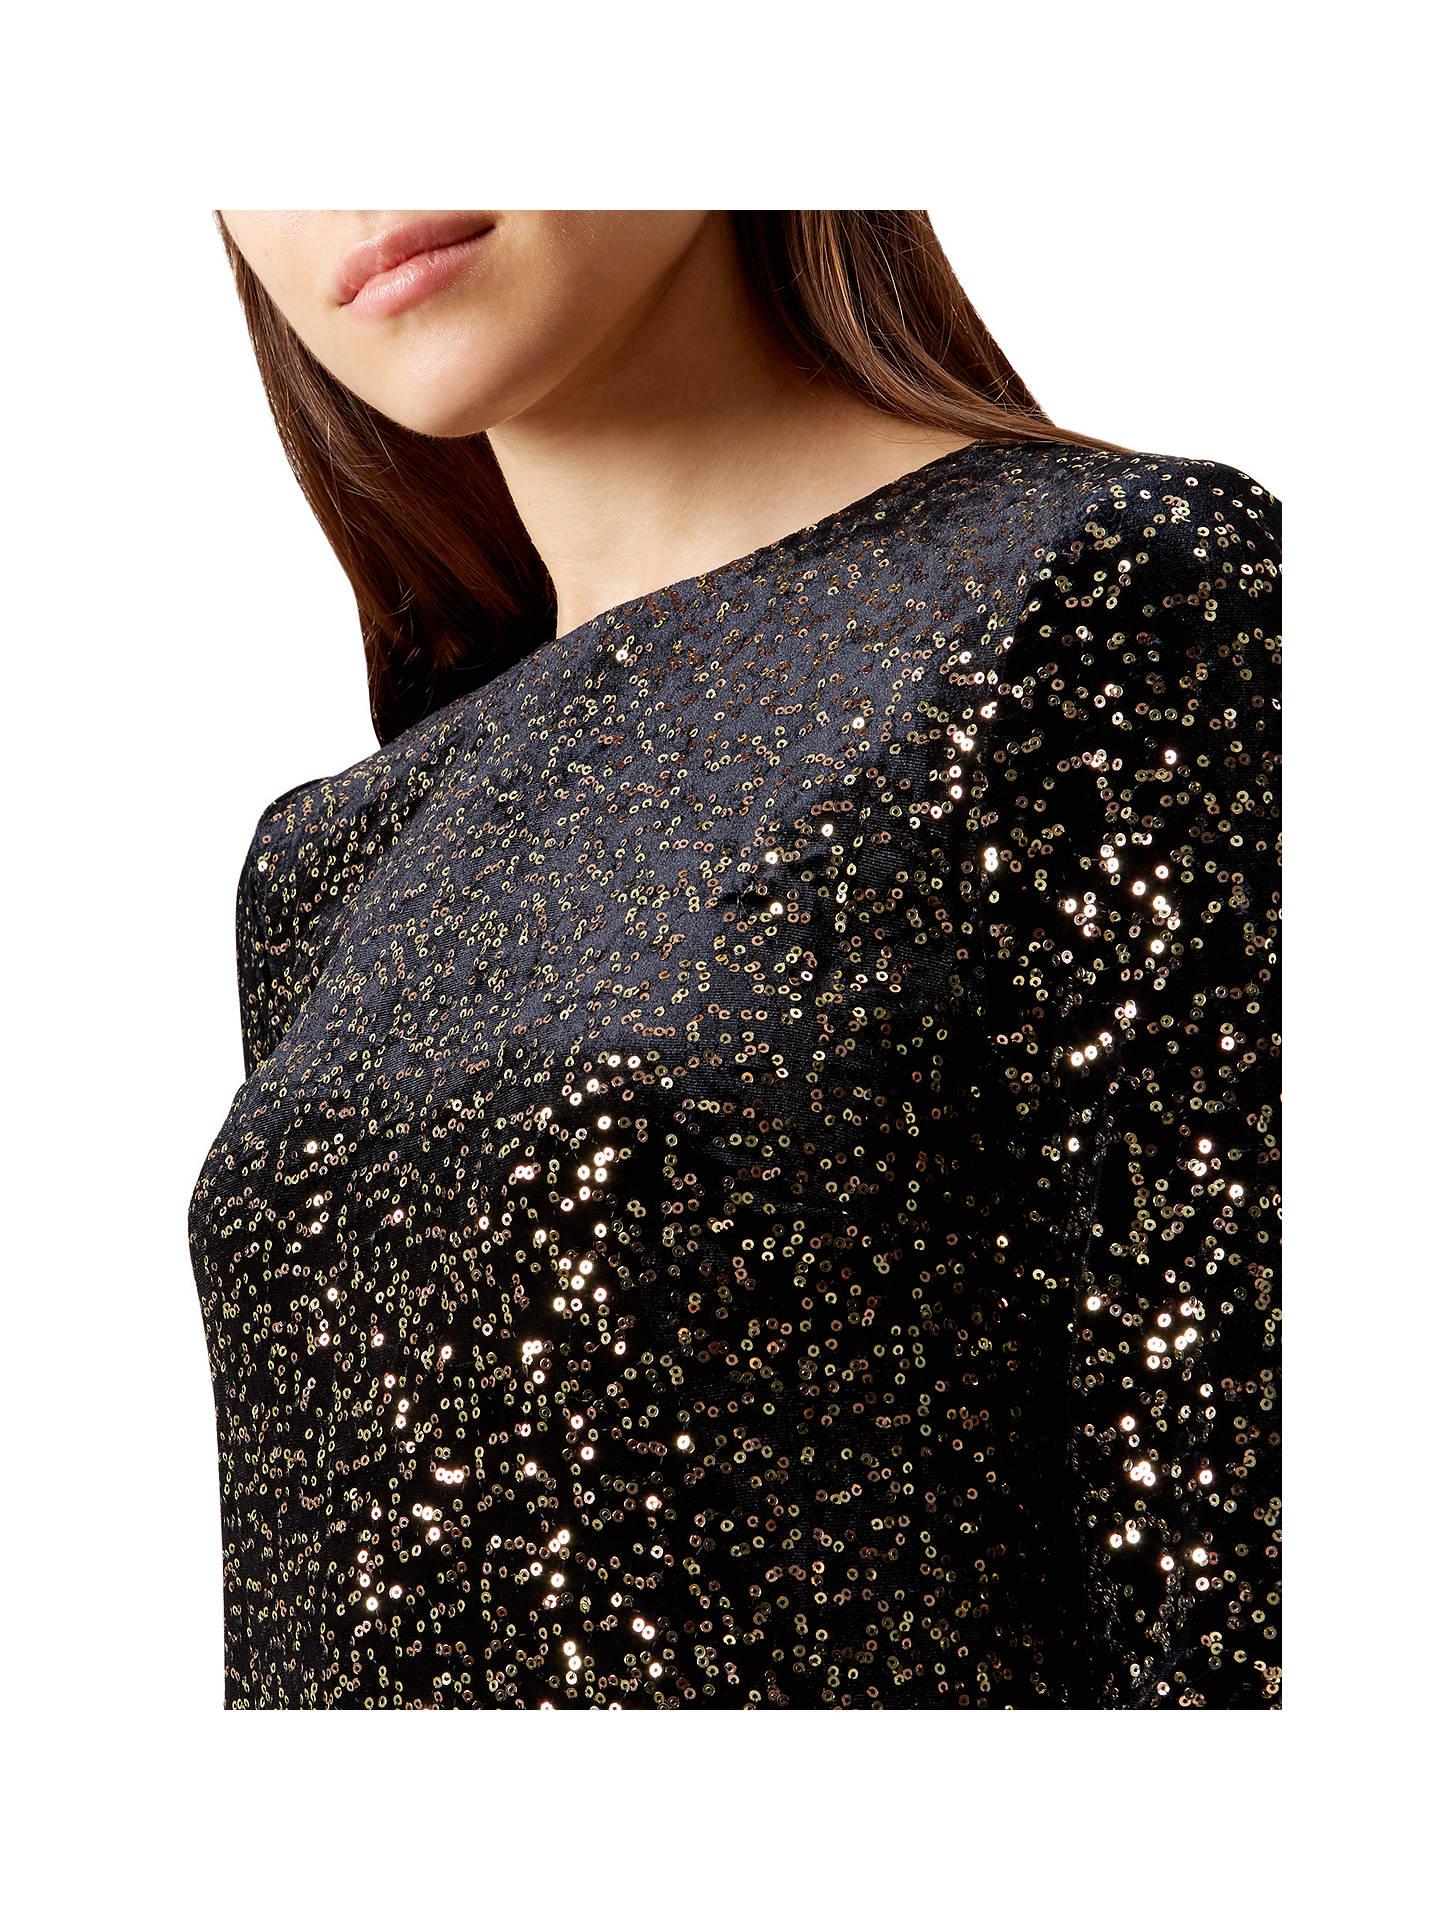 5c29e6c9 ... Buy Hobbs Mia Sequin Dress, Black/Gold, 6 Online at johnlewis.com